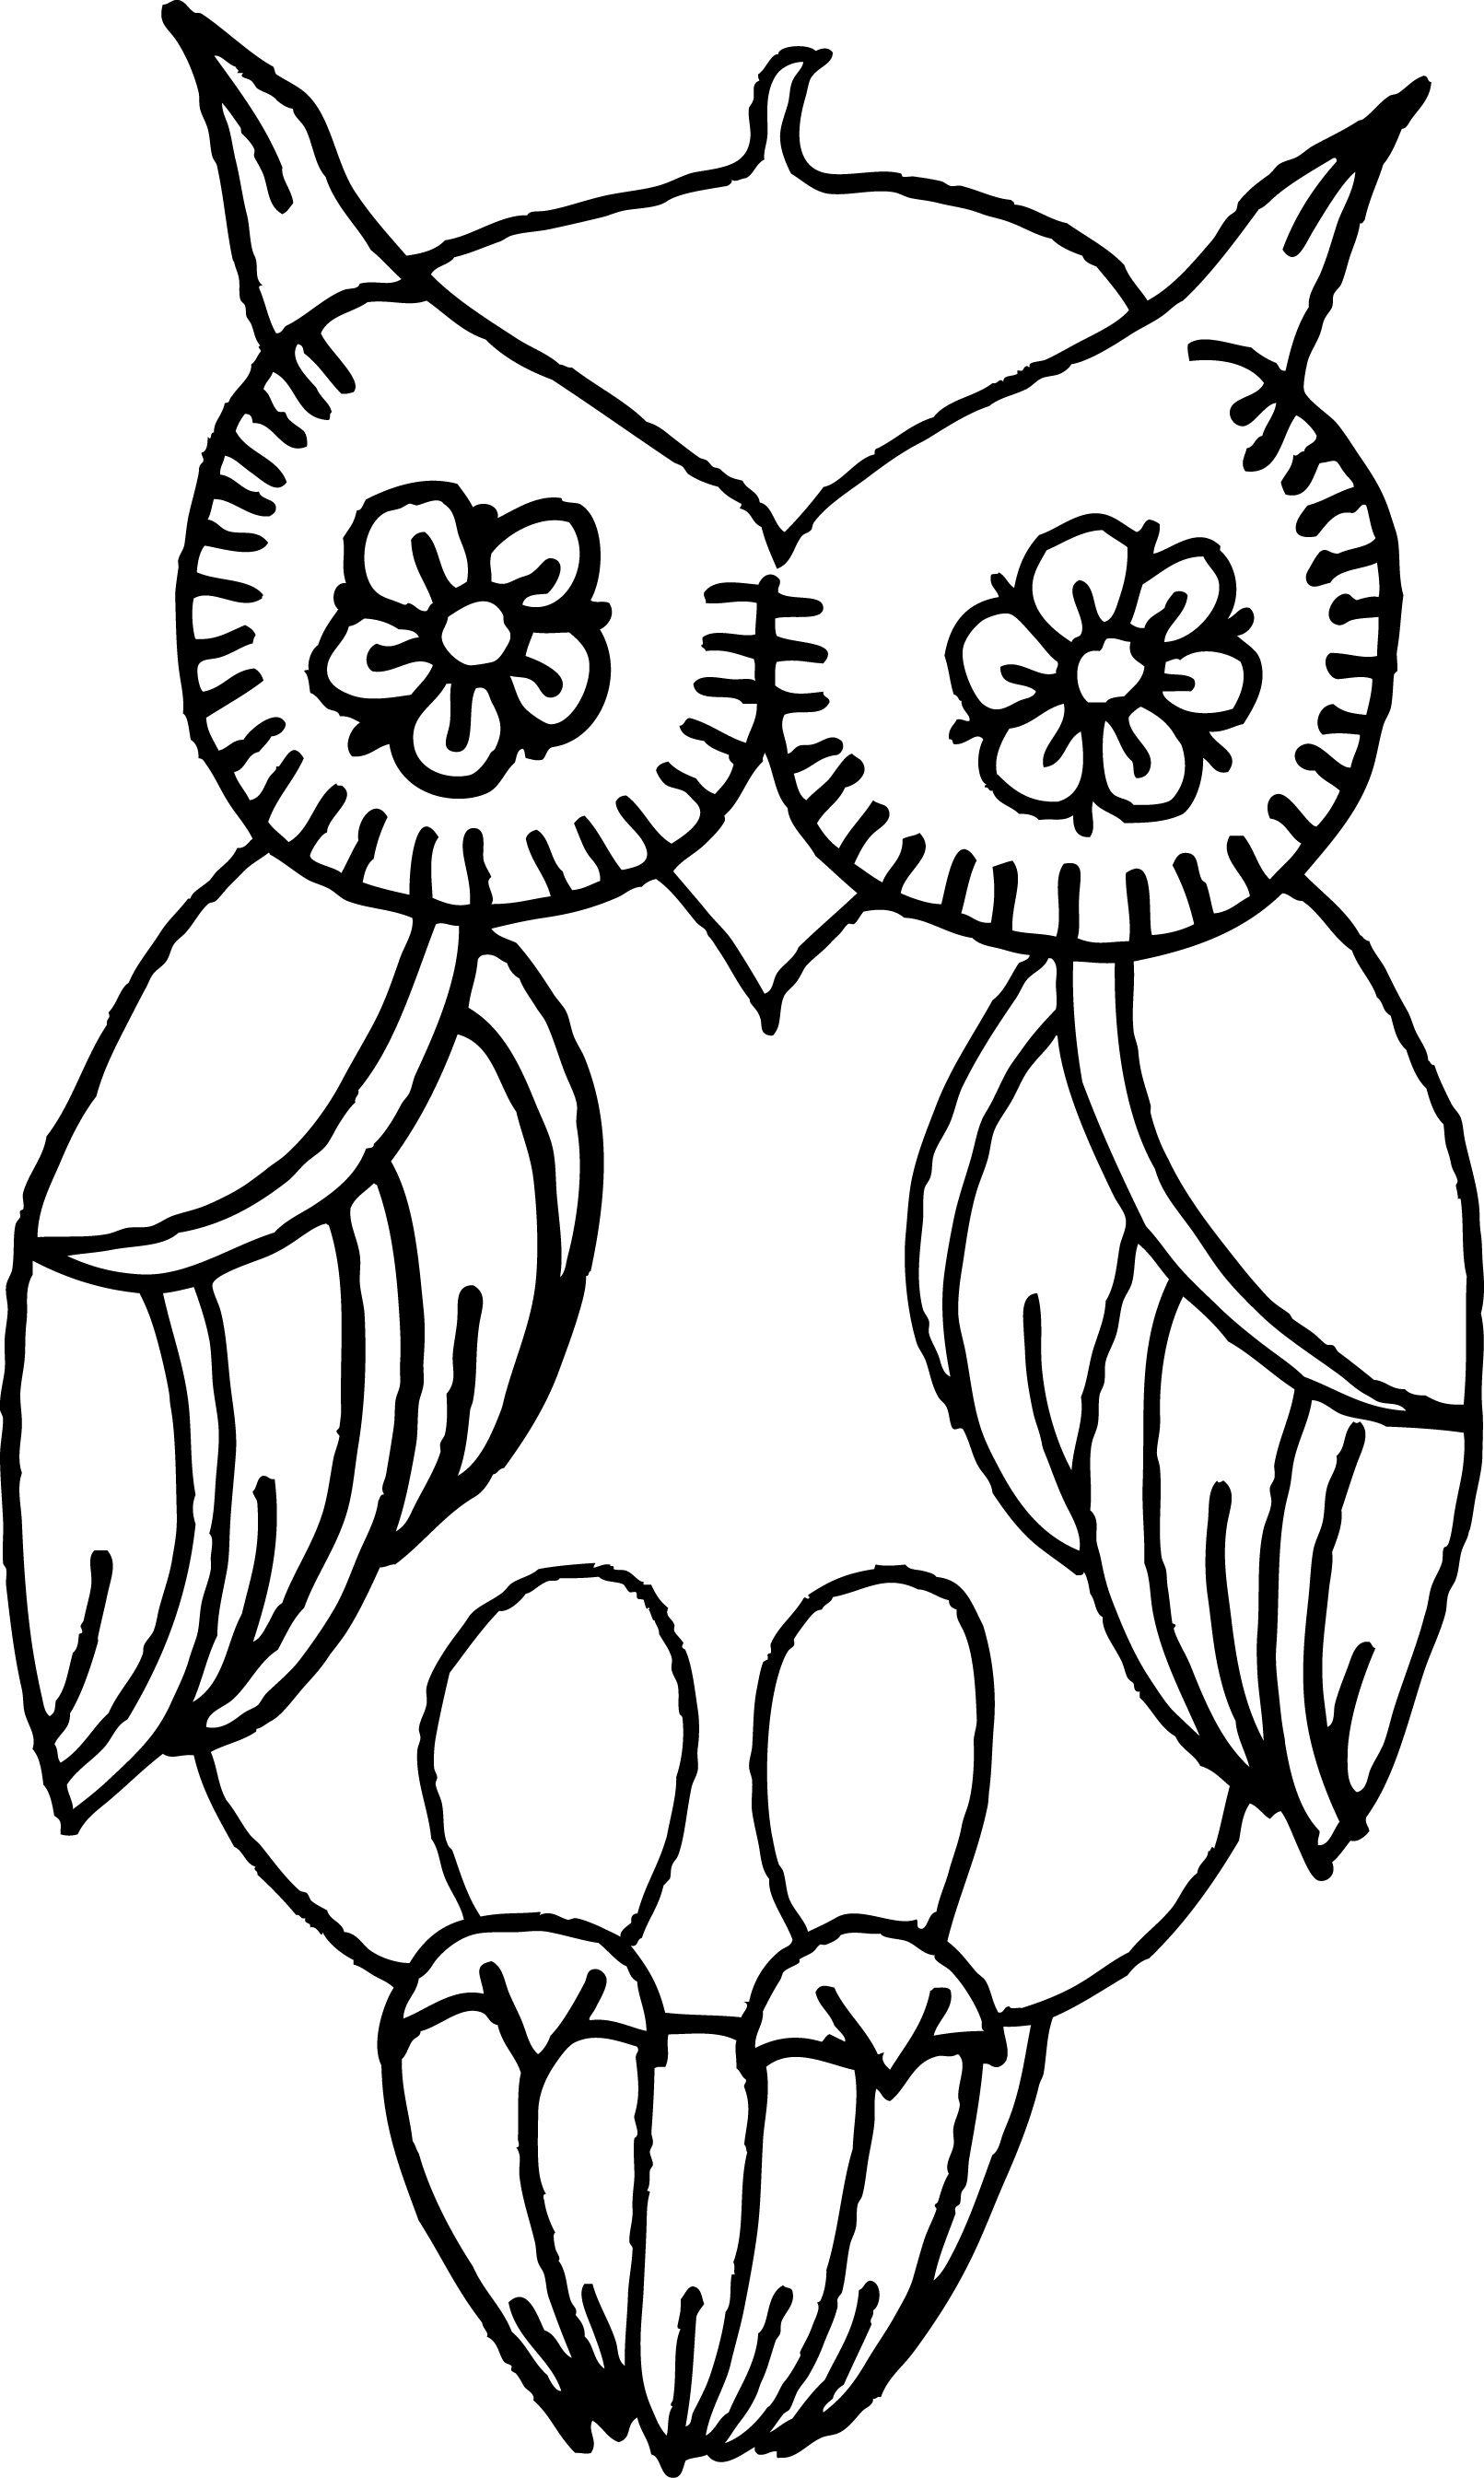 Whimsical Woodburned Owl Walnut Hollow Craft Wood Burning Stencils Beginner Wood Burning Wood Burning Art